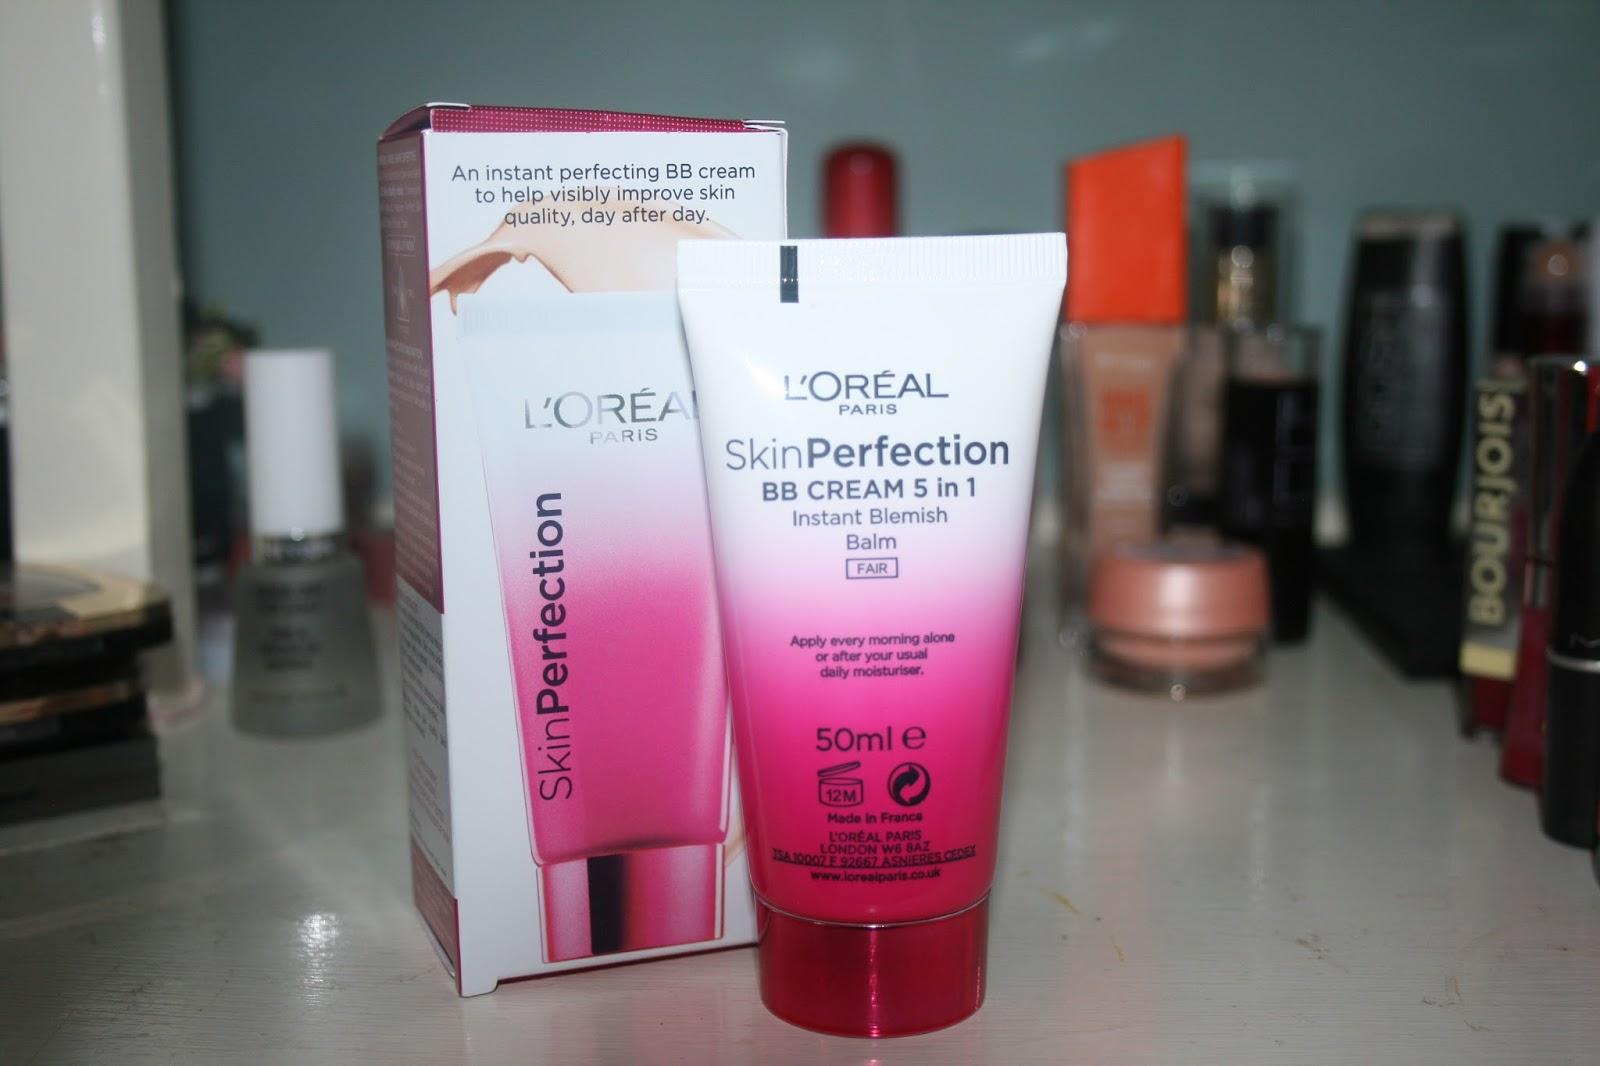 Gorgeous Darling Loreal Paris Skin Perfection Bb Cream